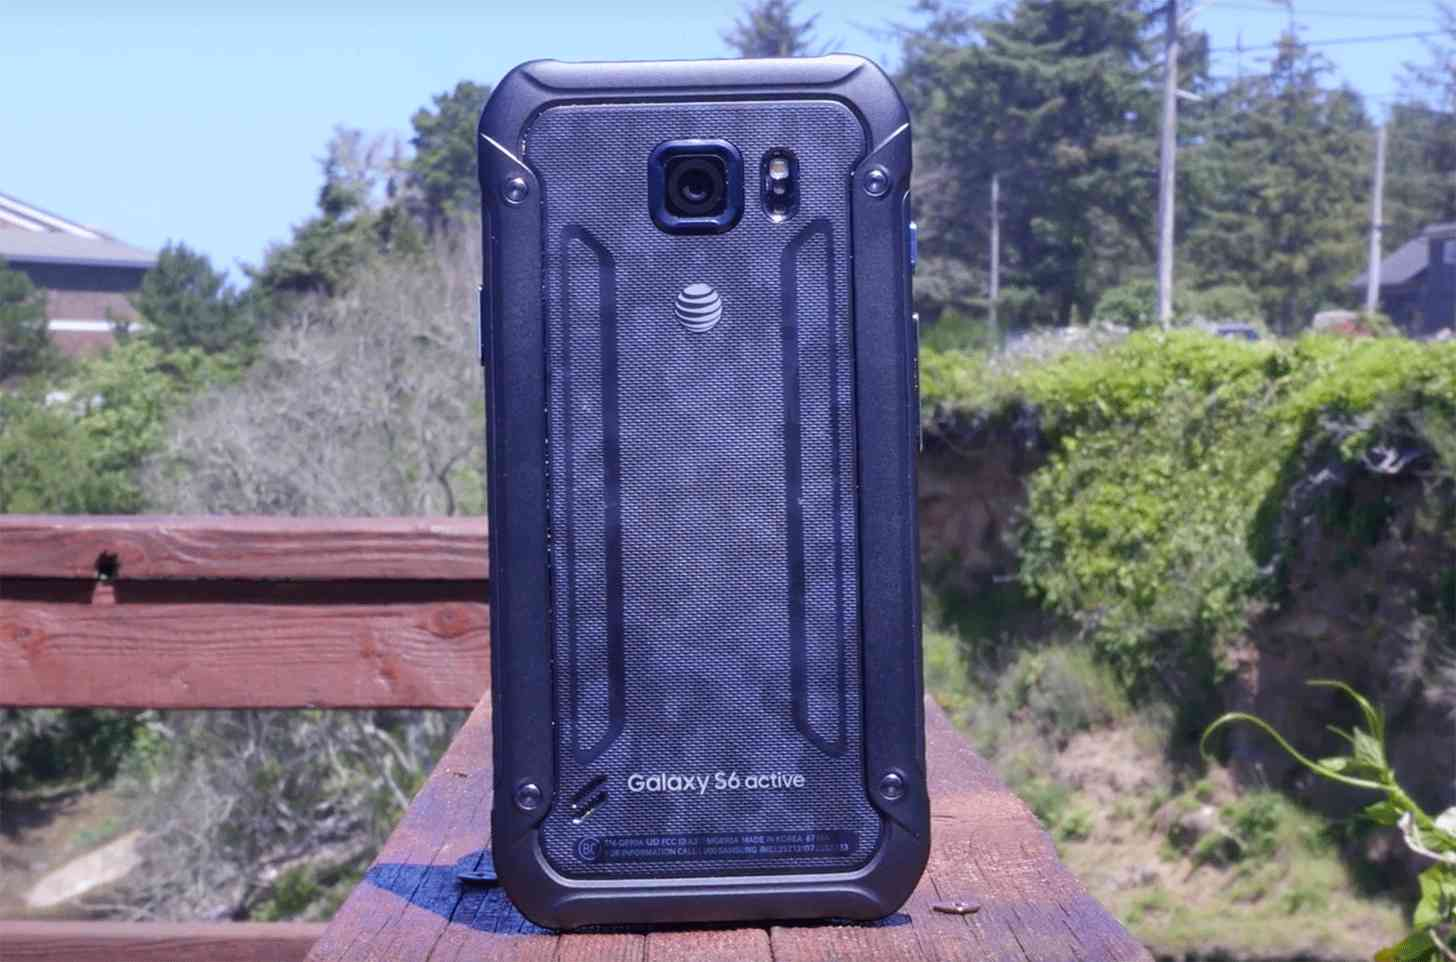 AT&T Samsung Galaxy S6 active review